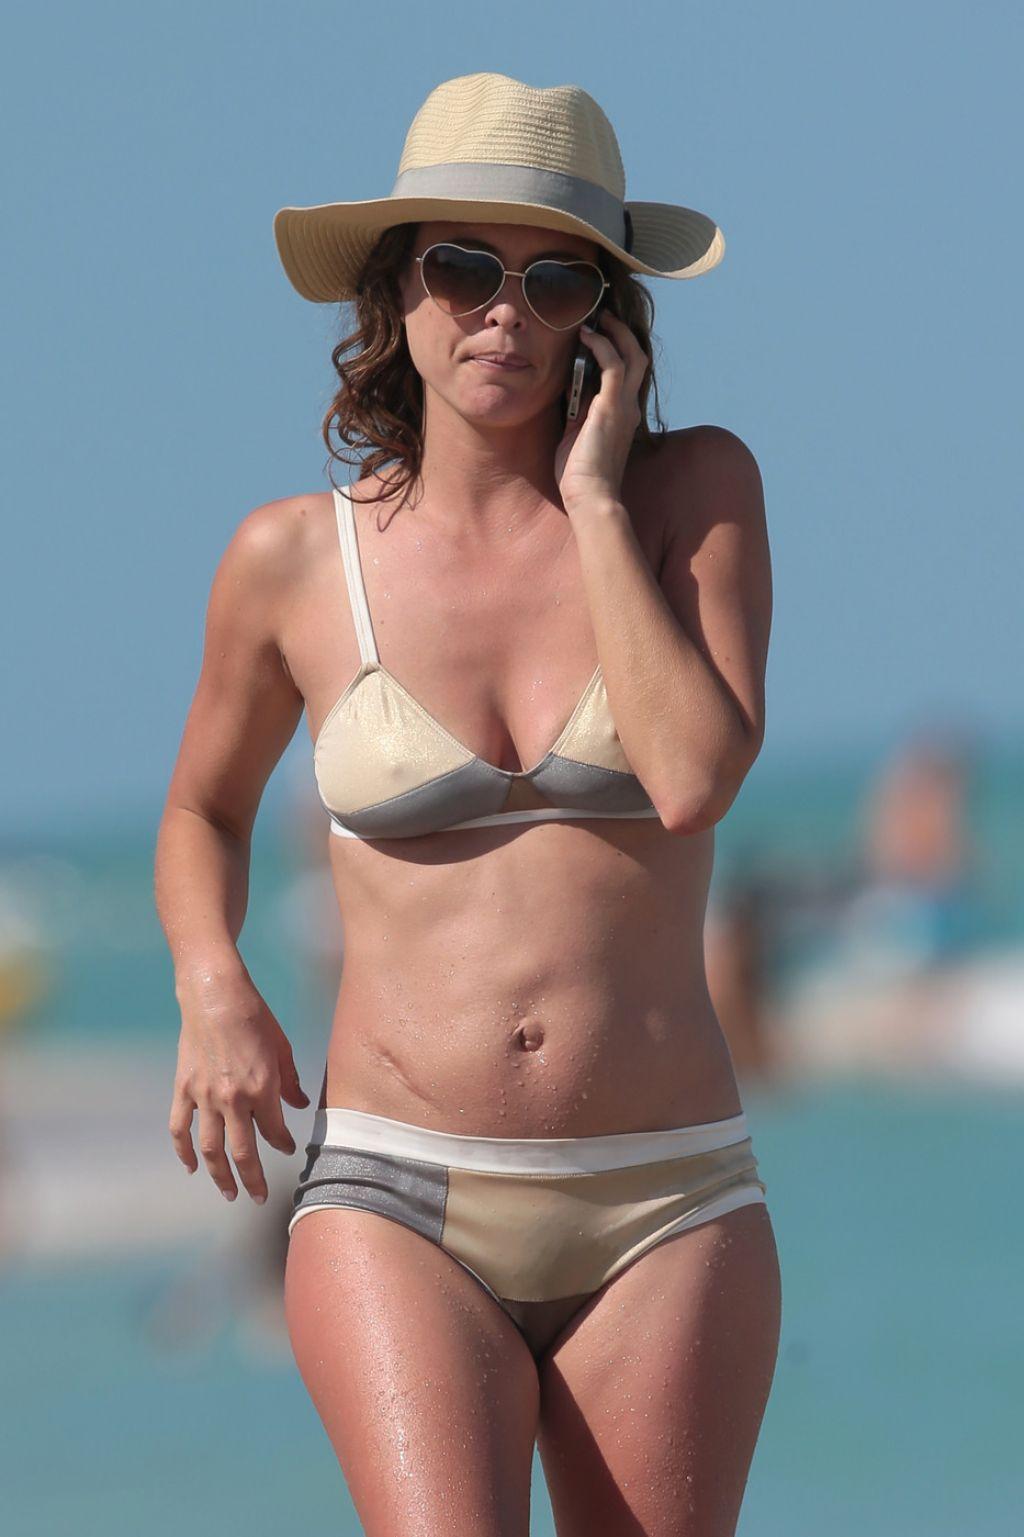 Josie Maran Bikini Pics Miami March 2015